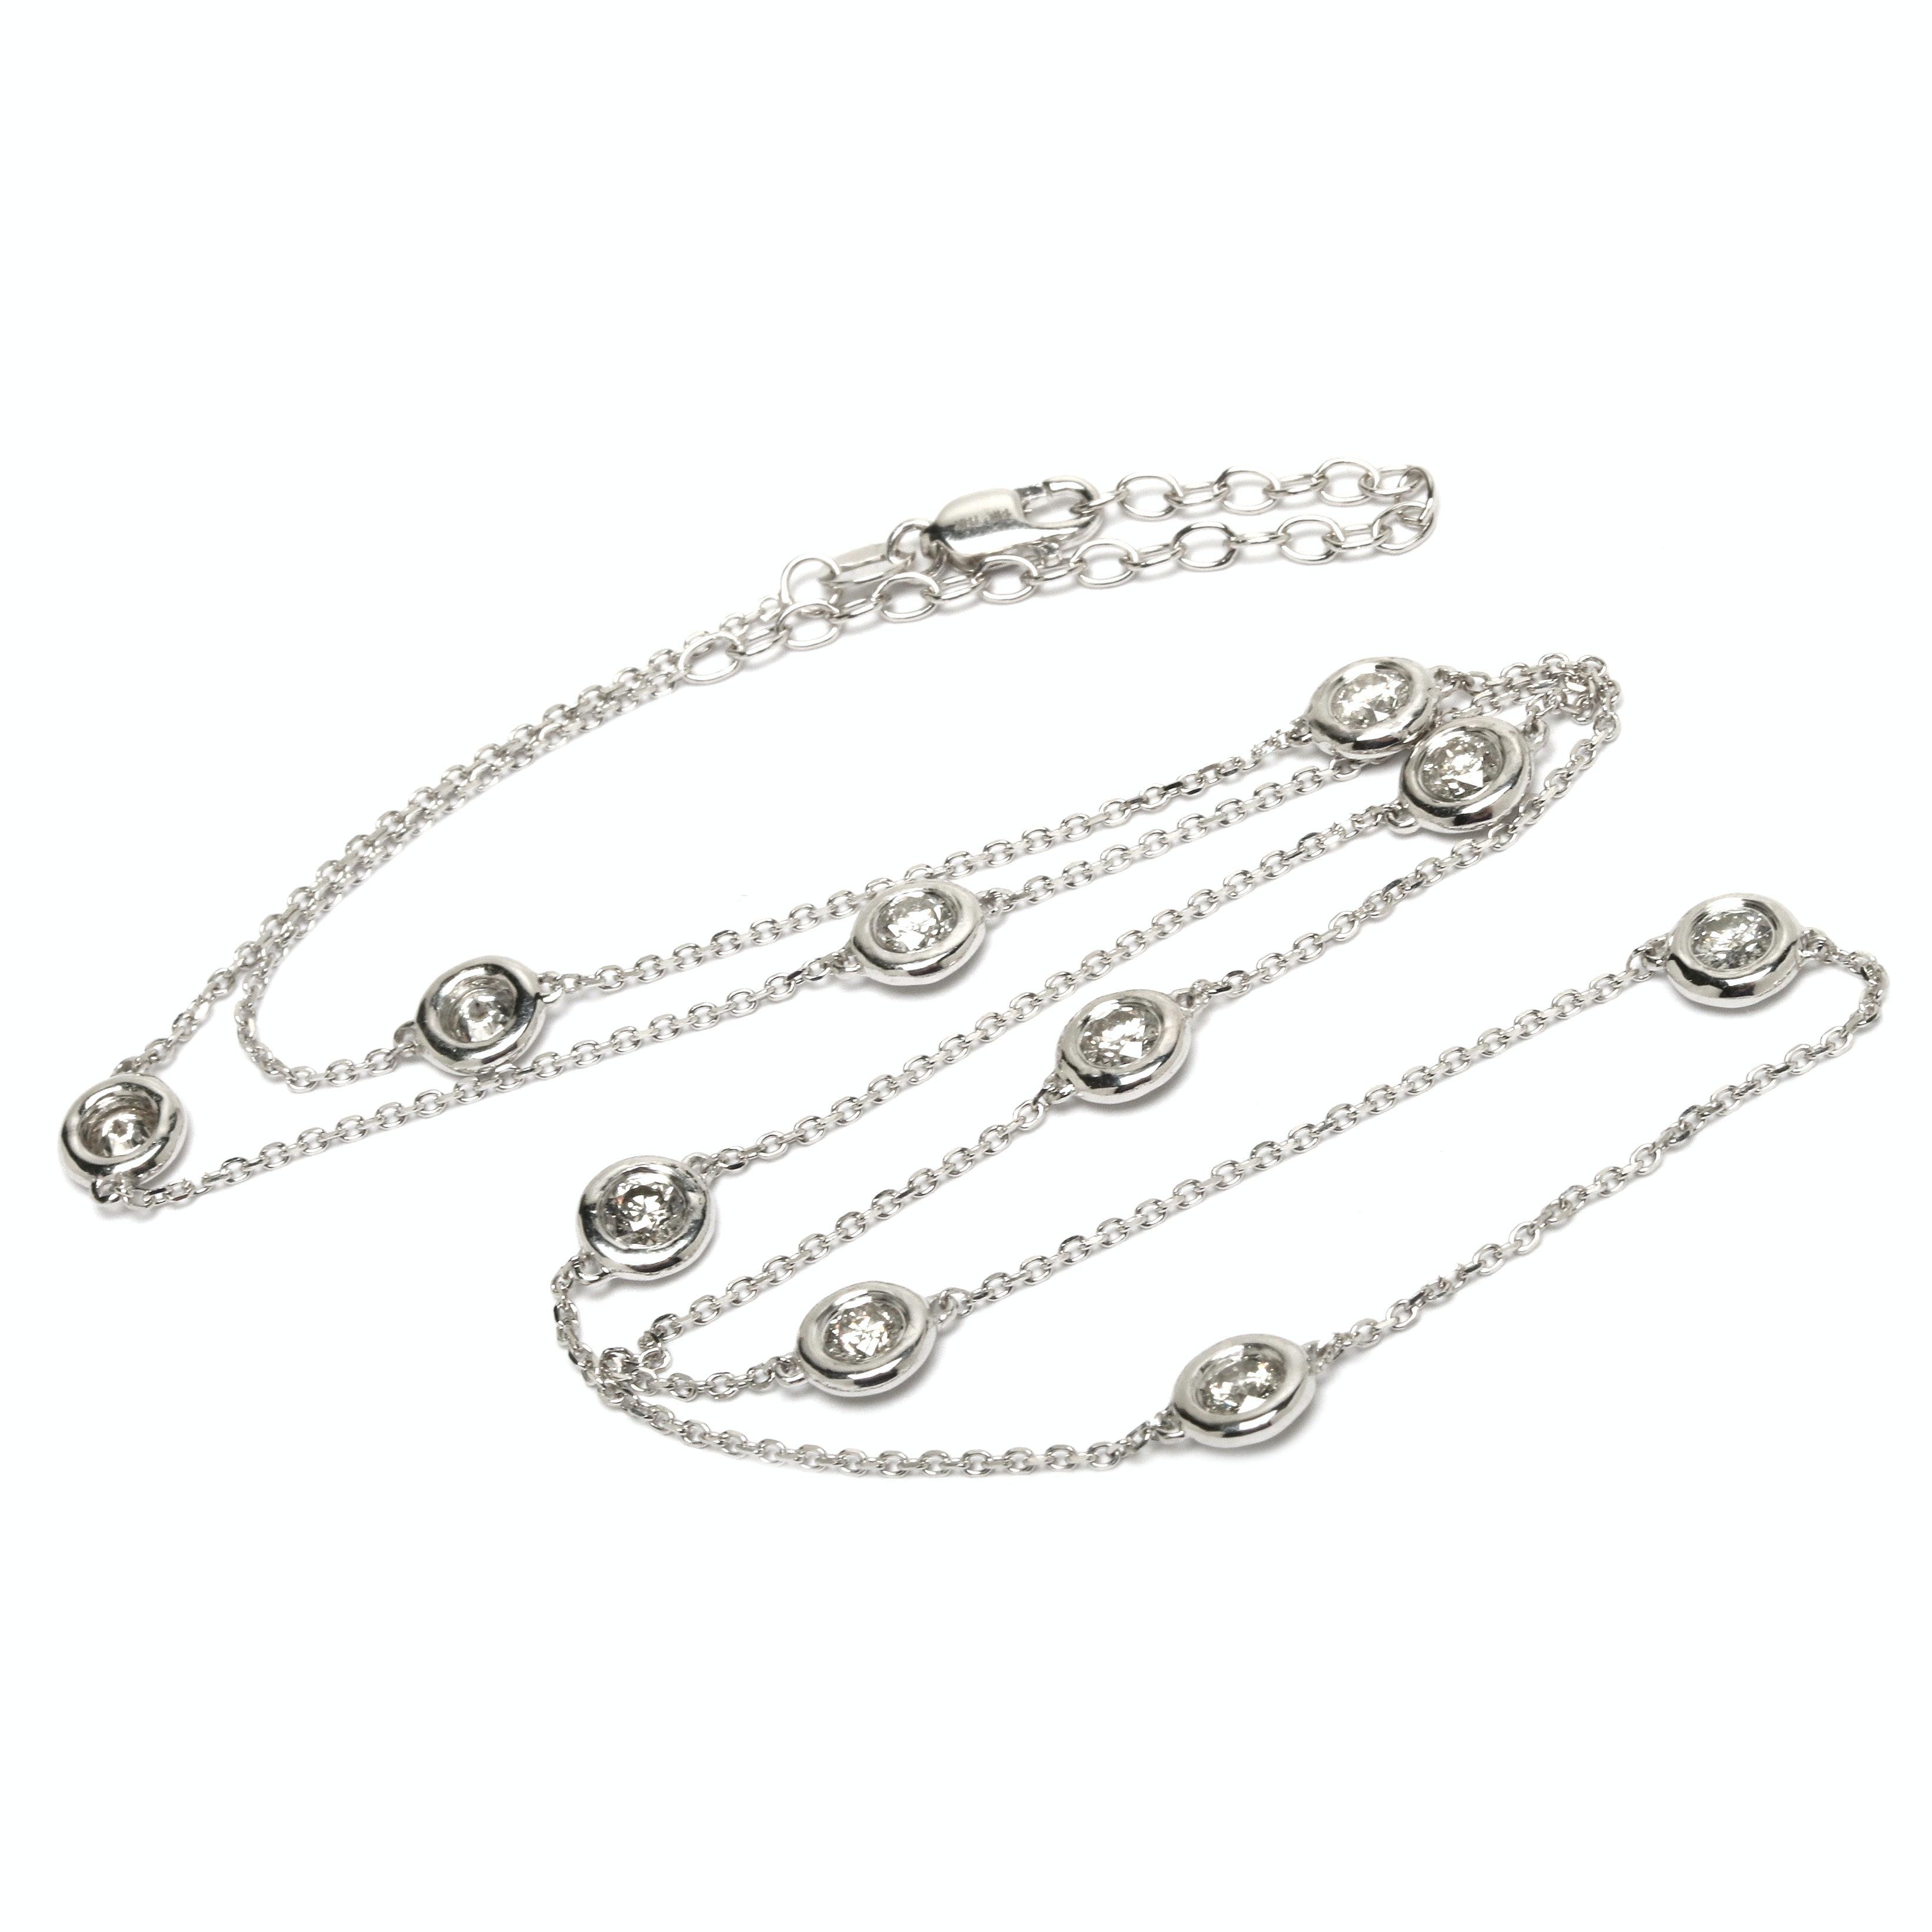 14K White Gold 1.55 CTW Diamond Station Necklace